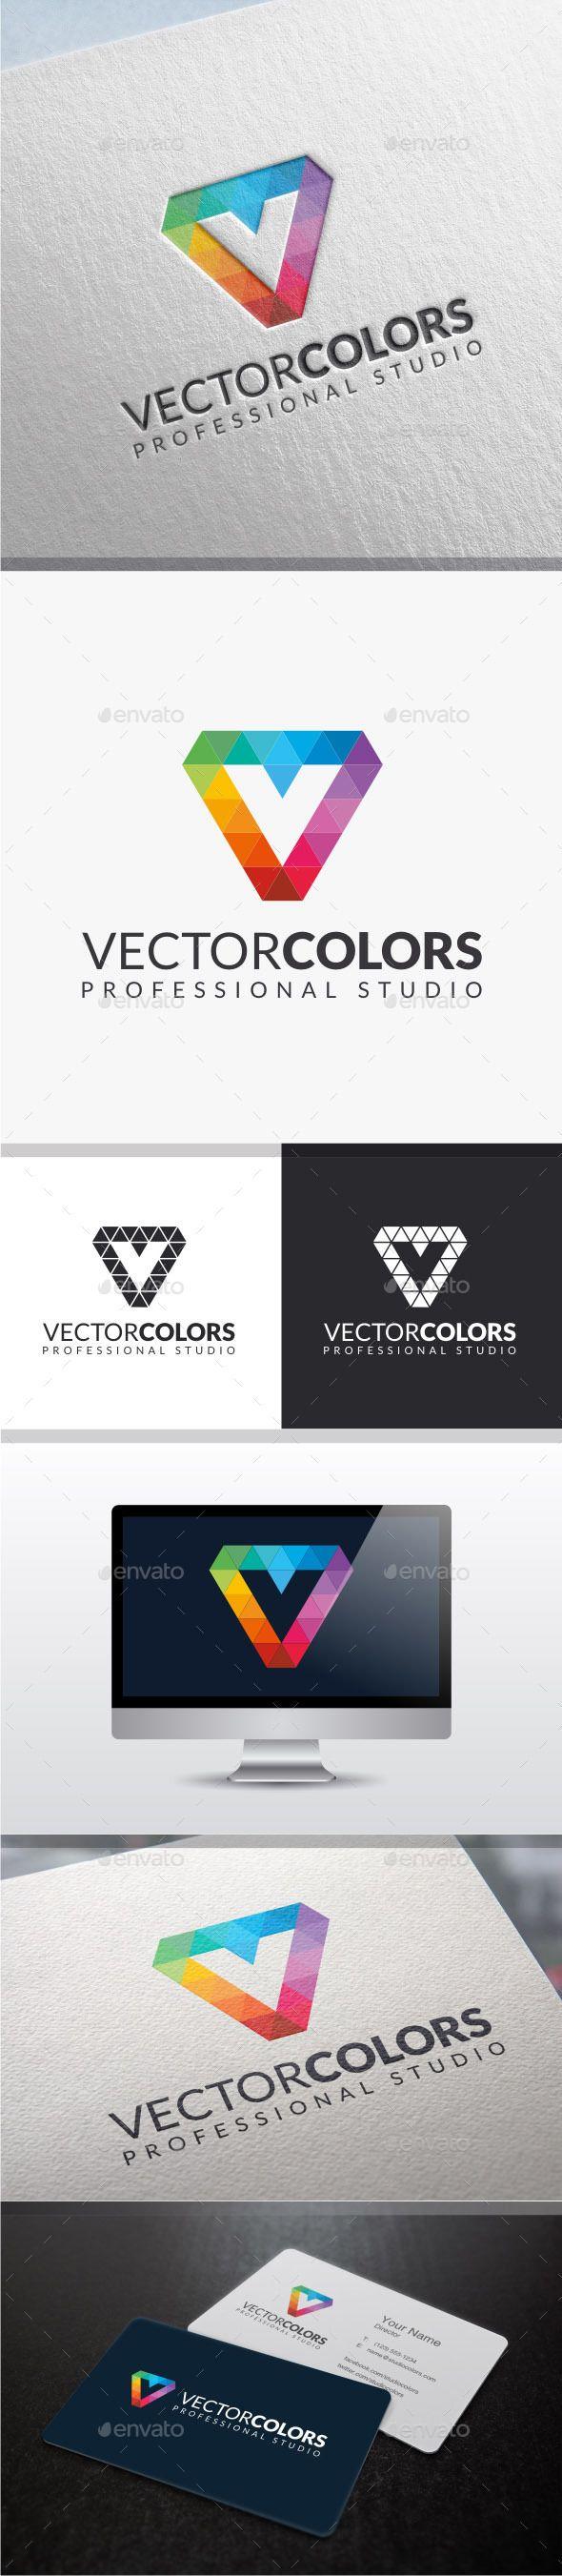 Vector Colors - Letter V Logo #diamond  #studio #technology #template • Available here → http://graphicriver.net/item/vector-colors-letter-v-logo-/8990374?s_rank=167&ref=pxcr